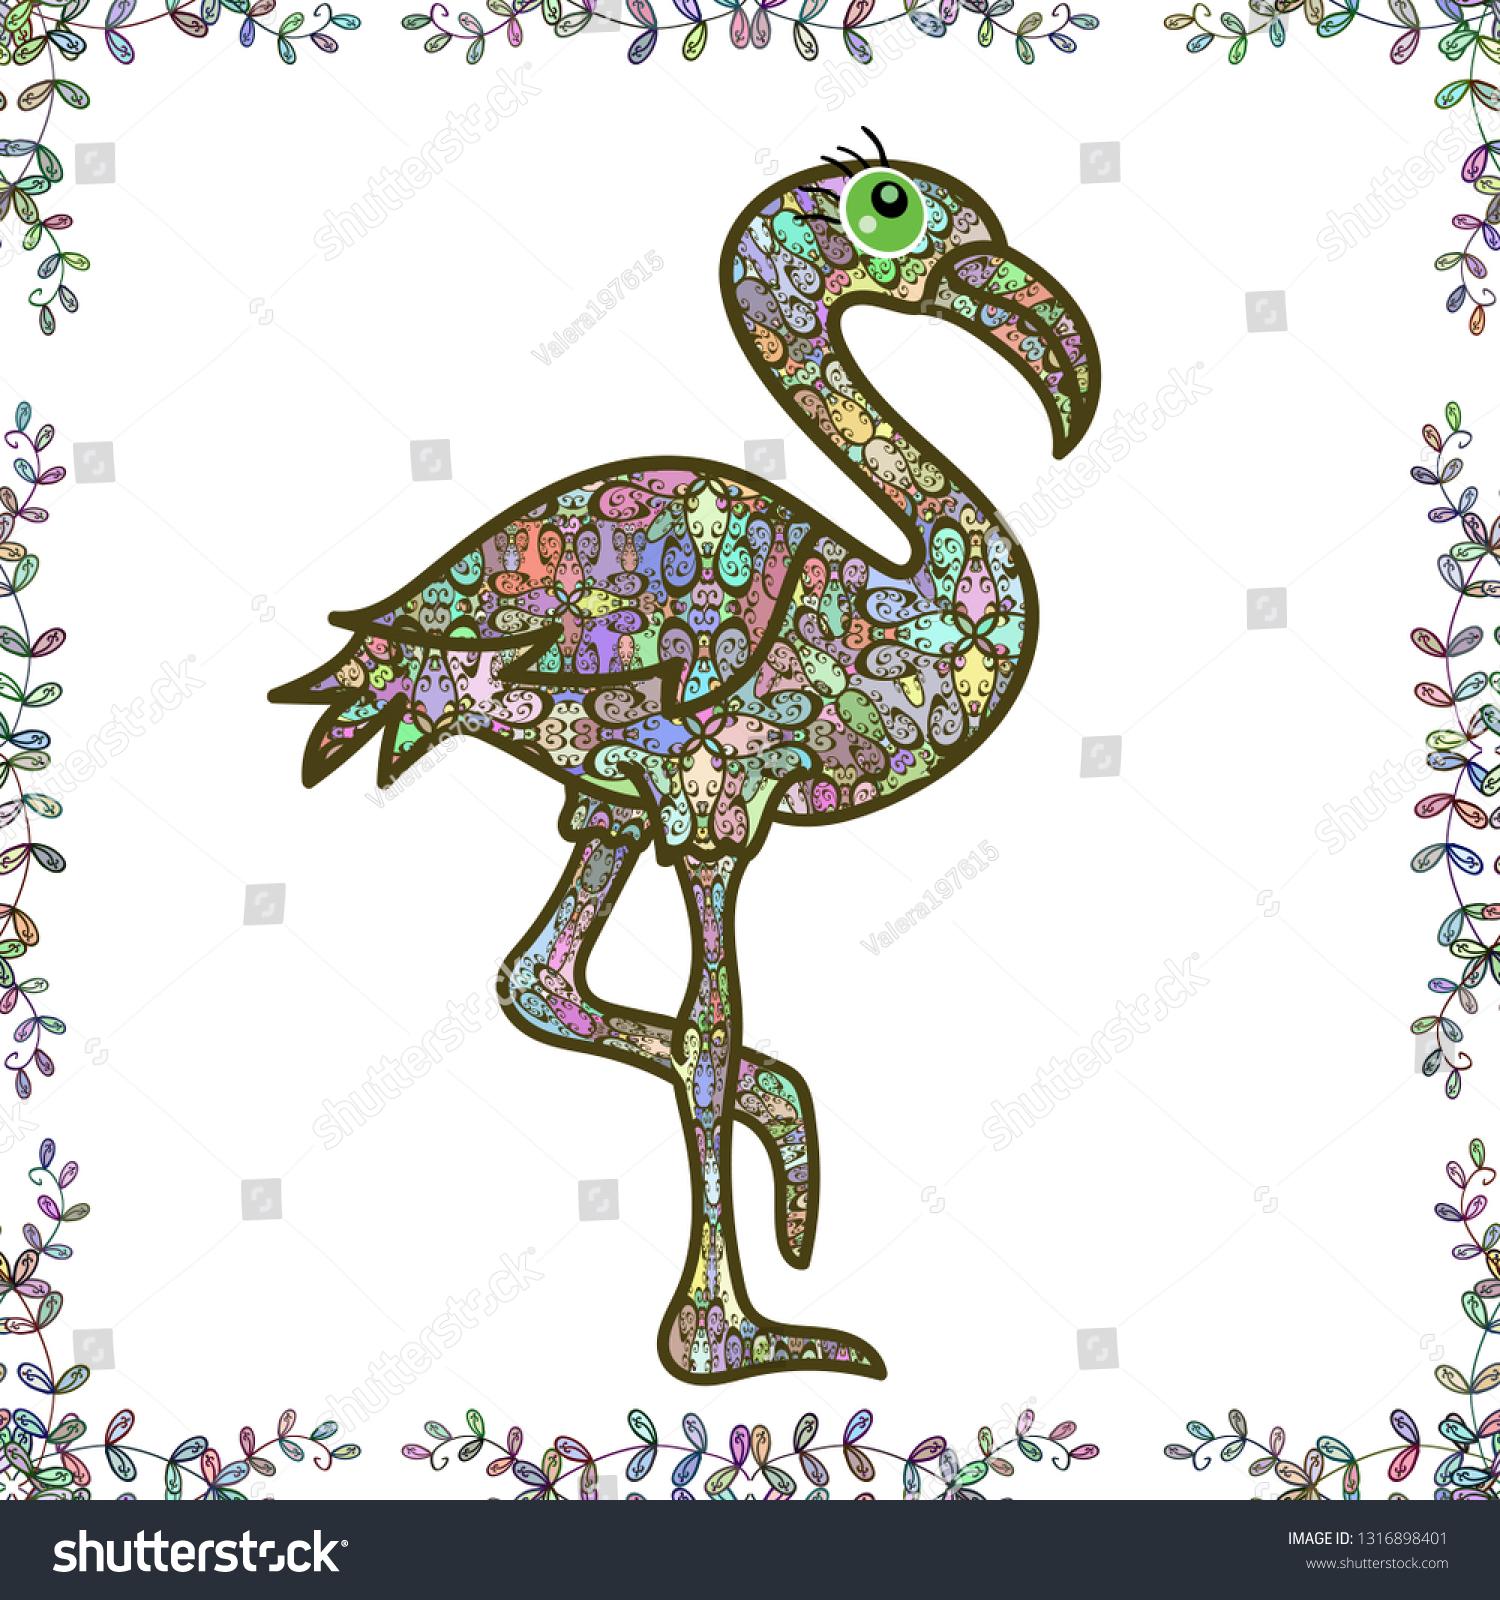 Animal Cute Nature Fauna Illustration Seamless Pattern Cartoon Neutral White And Green Colors Flamingo Set Nice